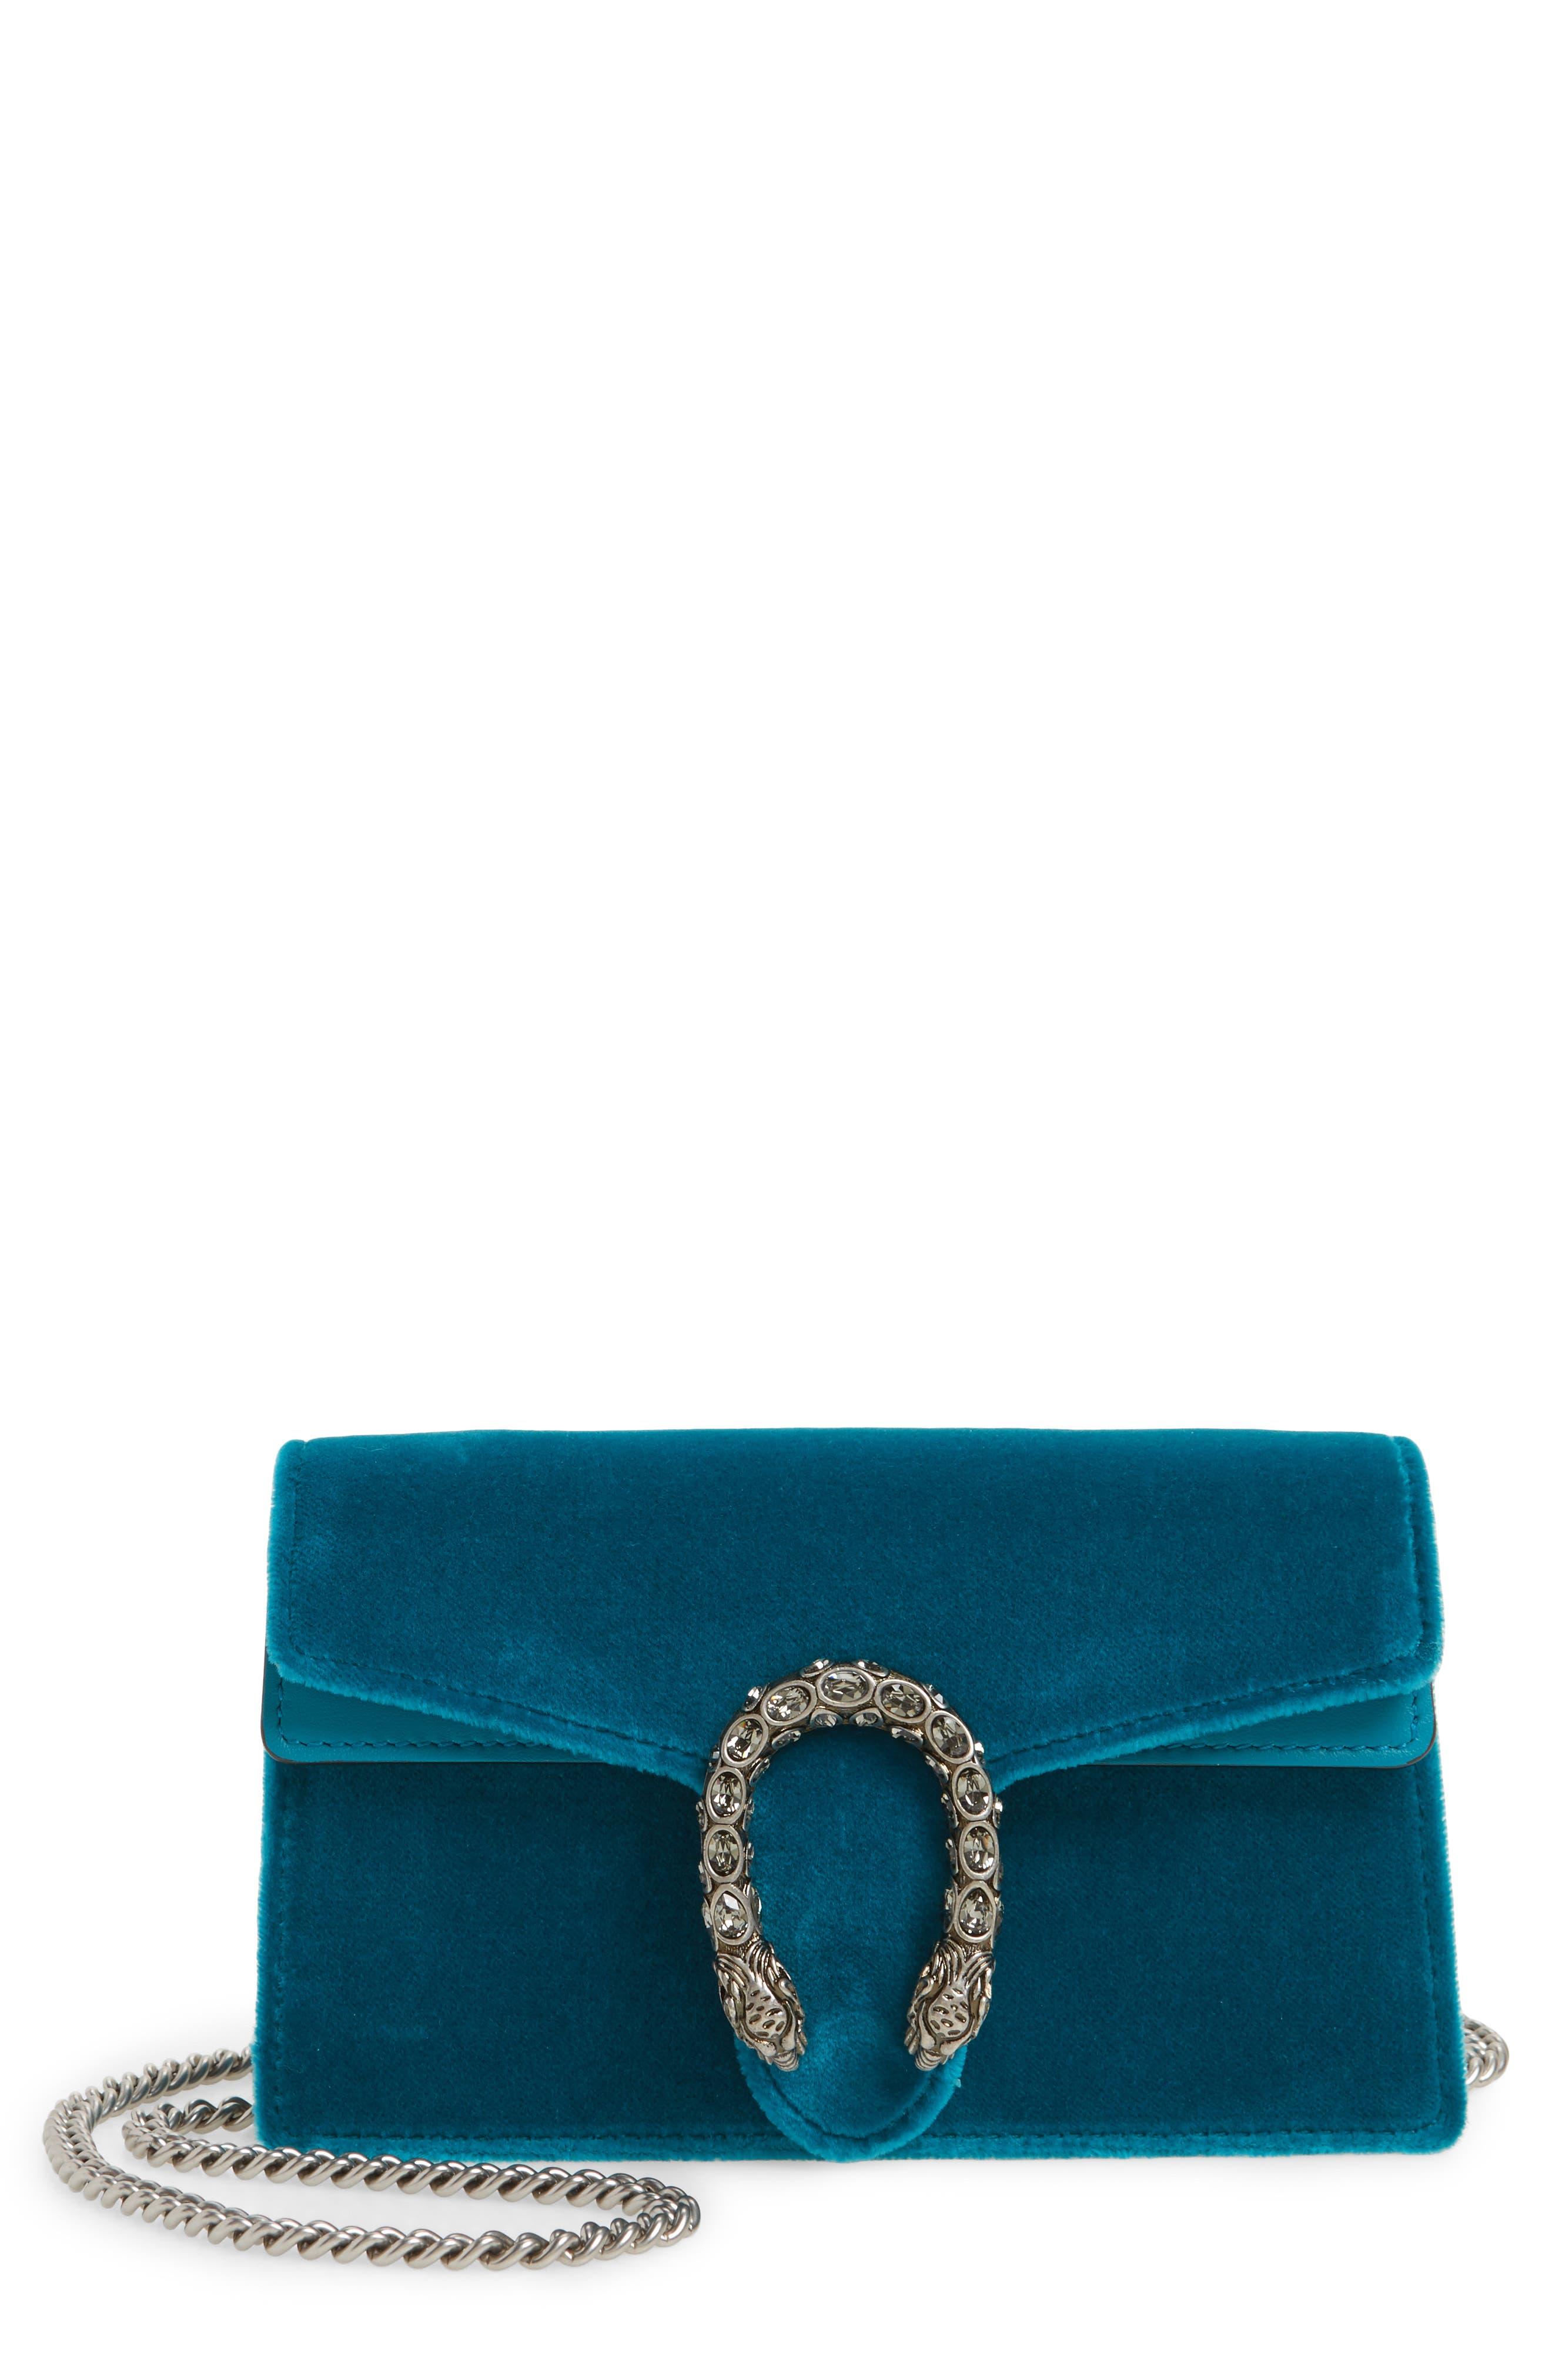 GUCCI, Super Mini Dionysus Velvet Shoulder Bag, Main thumbnail 1, color, PIVONE